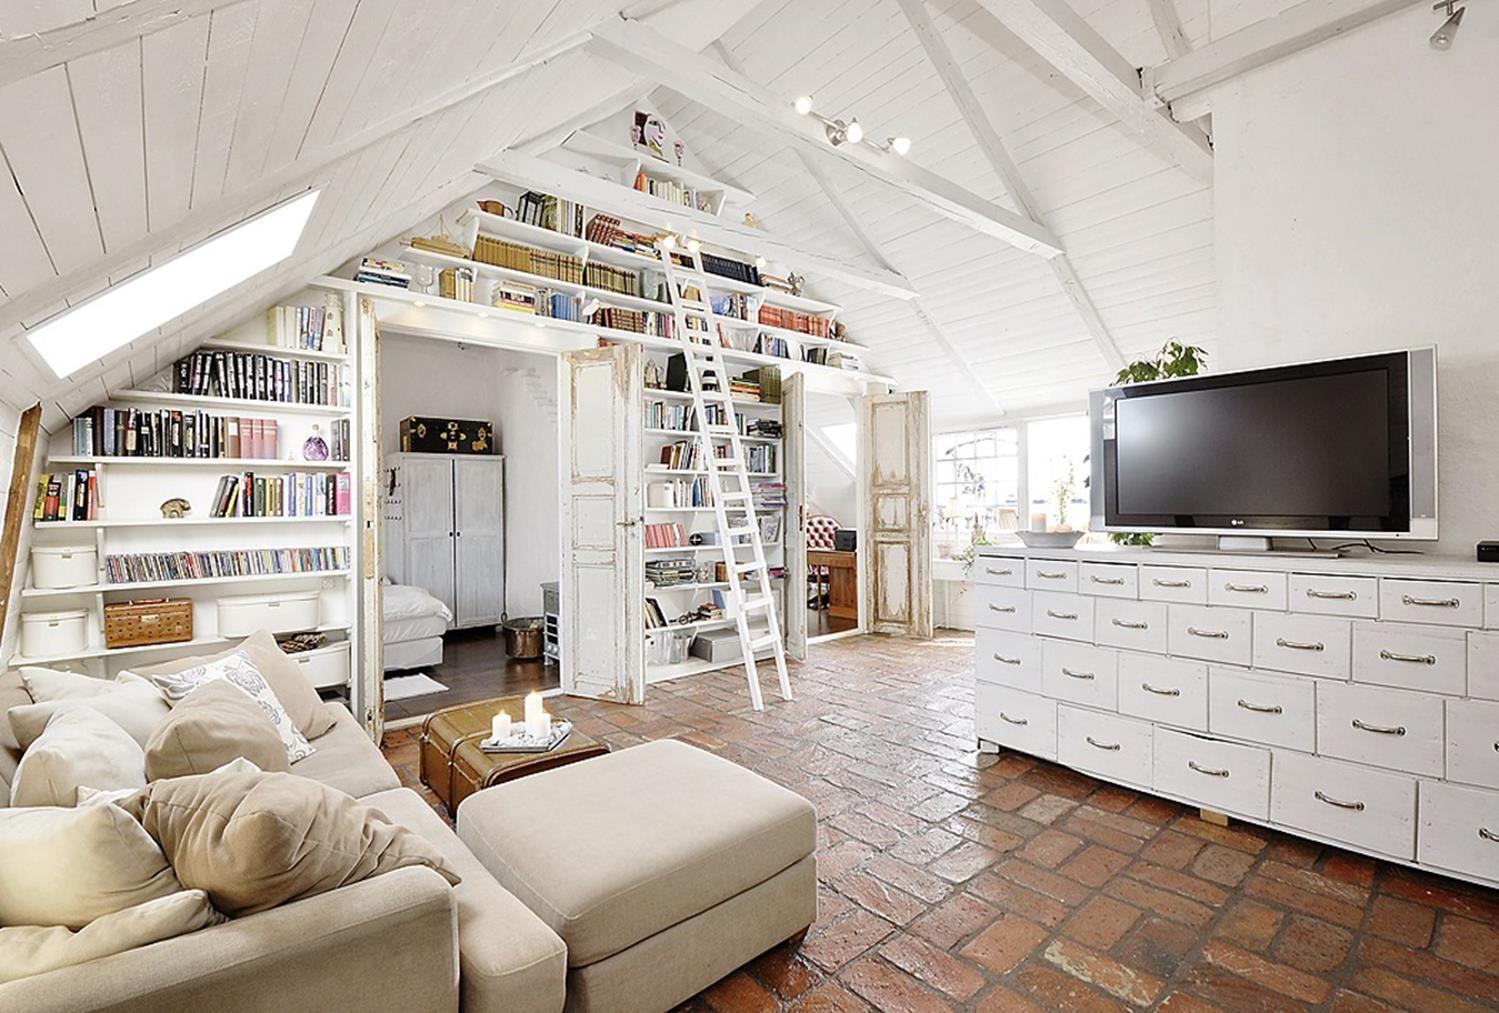 40 Stunning Shabby Chic Apartment Decorating Ideas Chic Apartment Decor Attic Living Rooms Shabby Chic Apartment